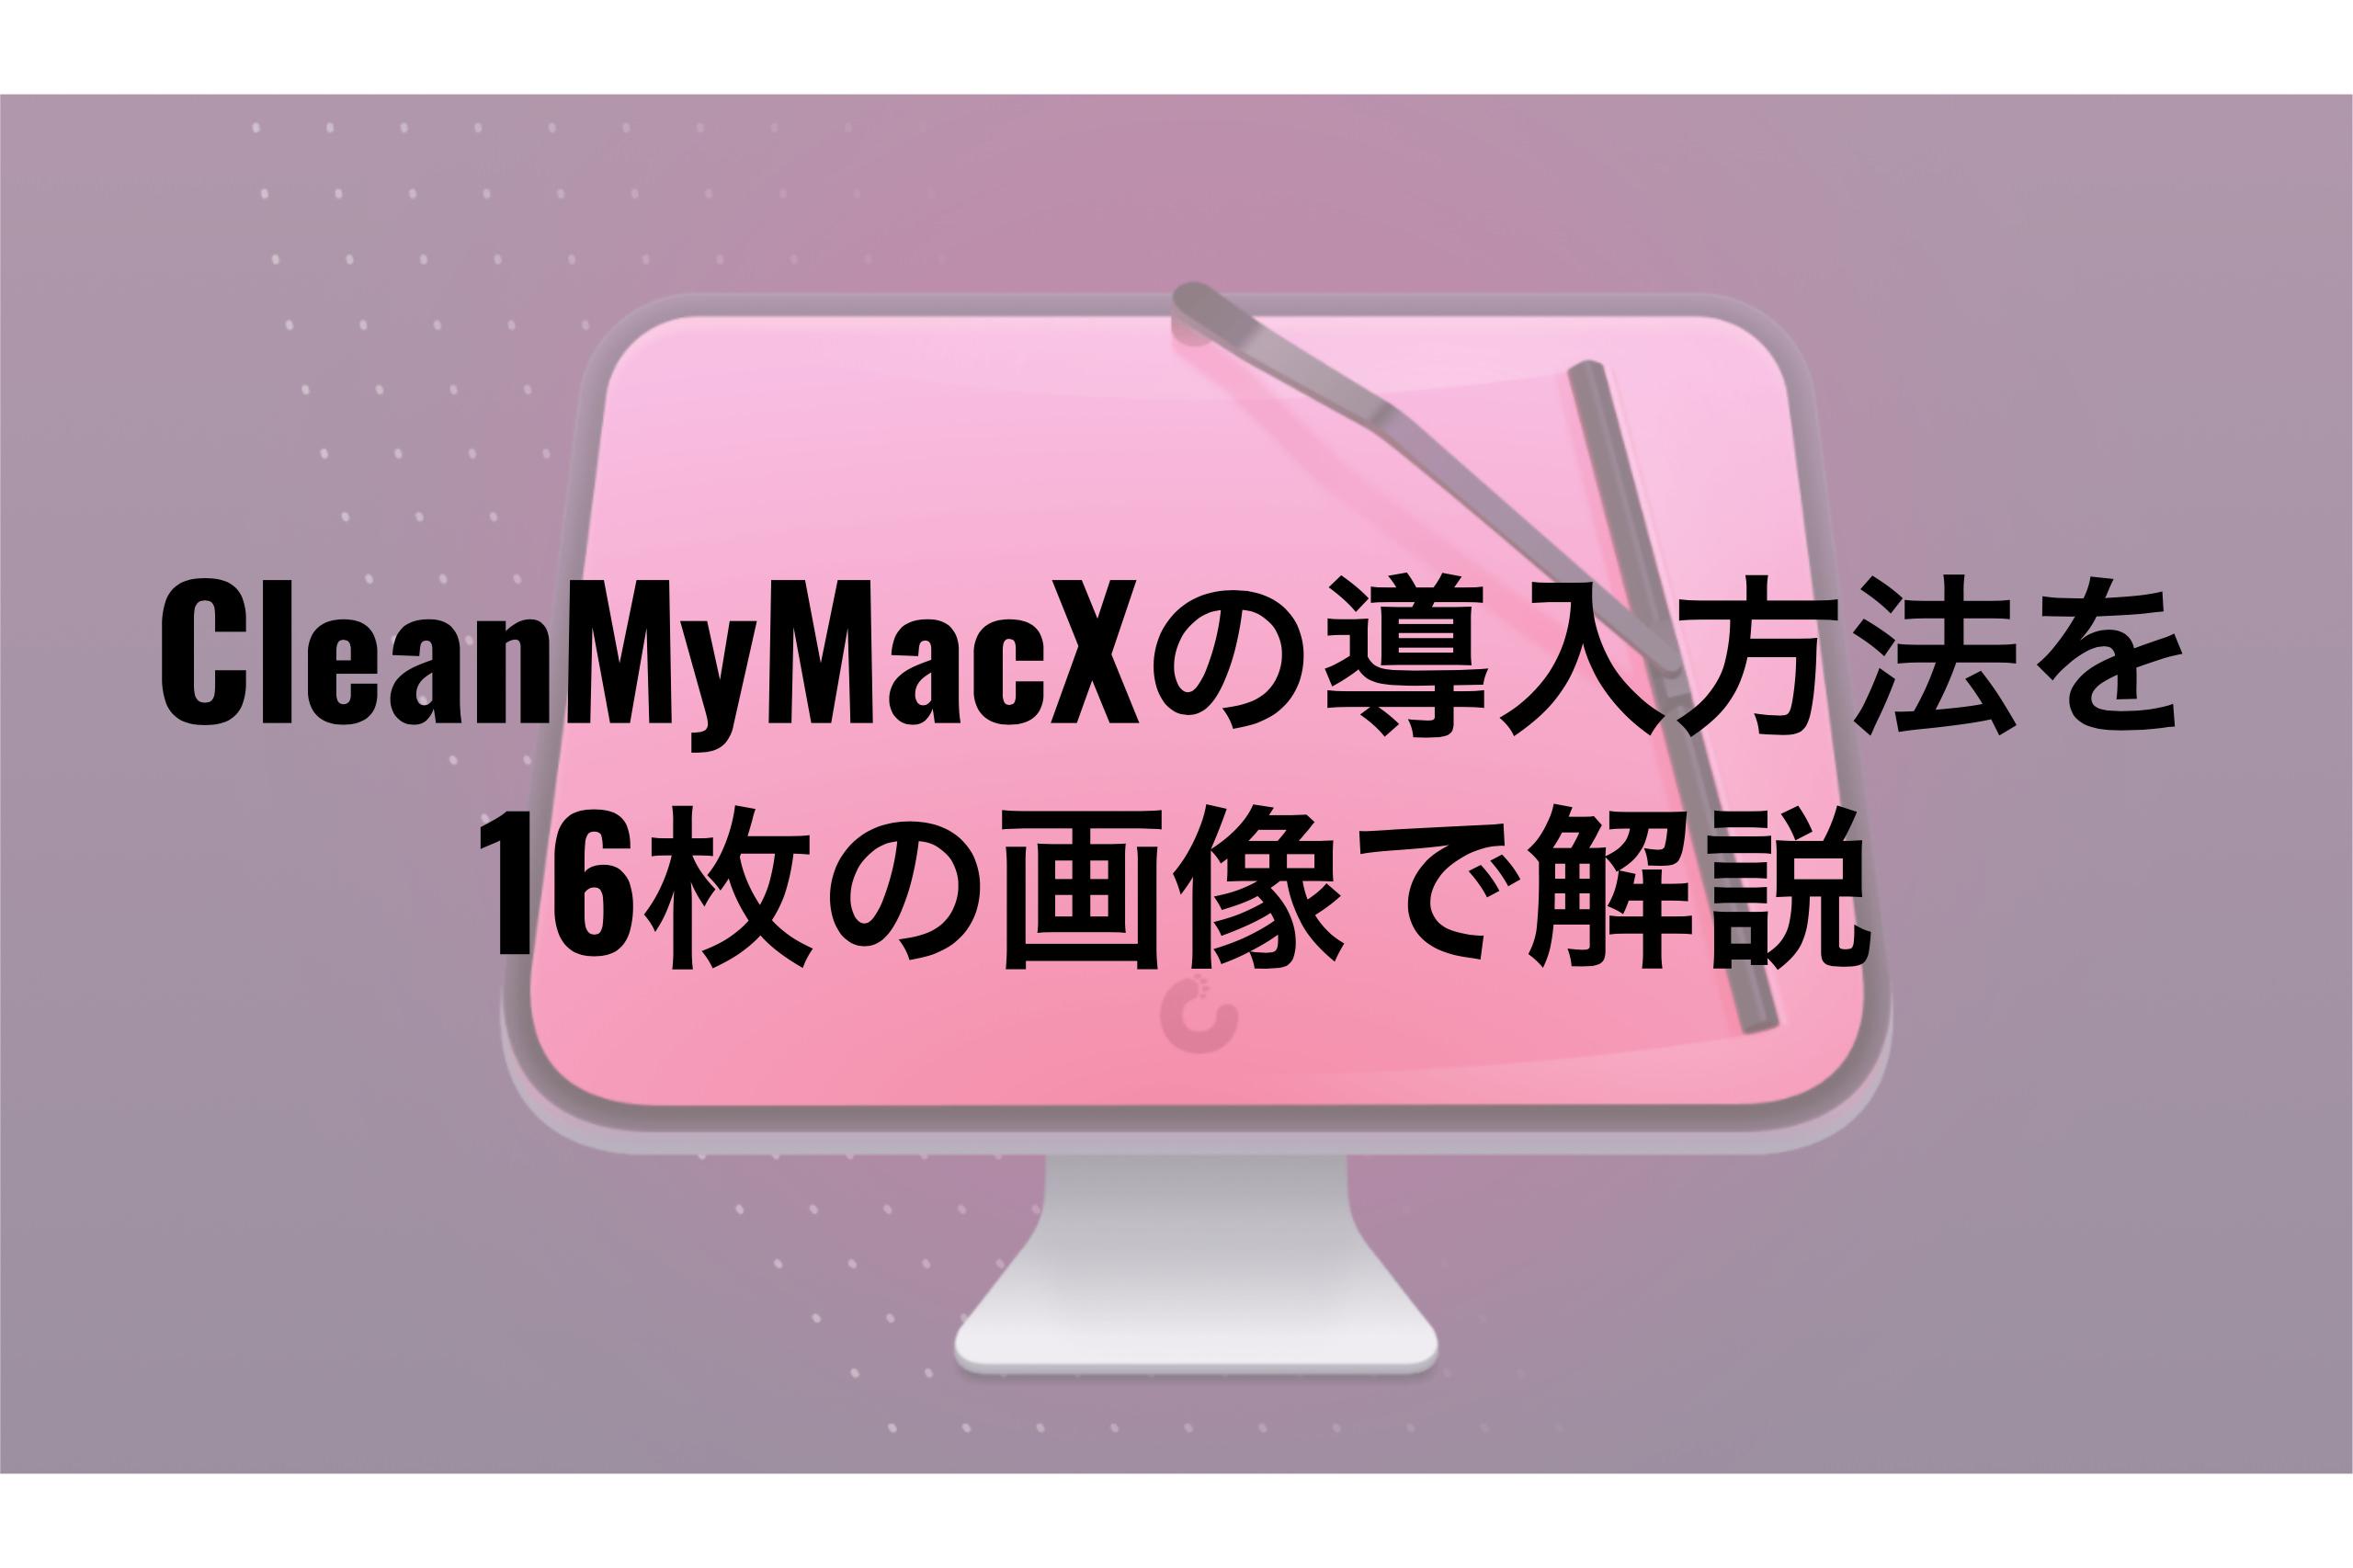 CleanMyMac Xの導入方法を16枚の画像で解説